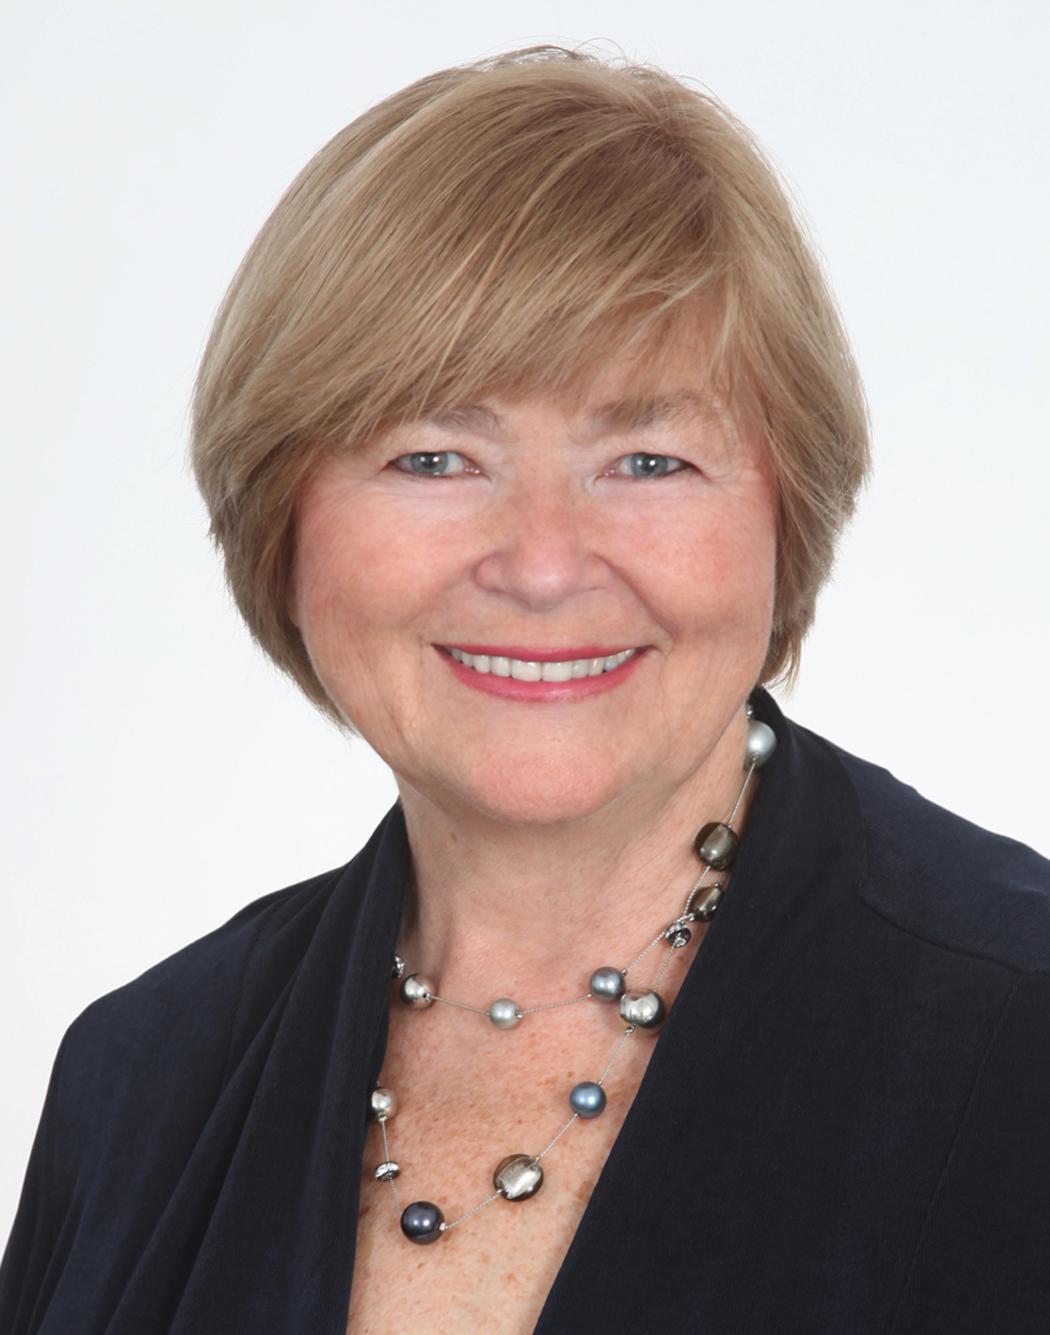 Helga Wetzold